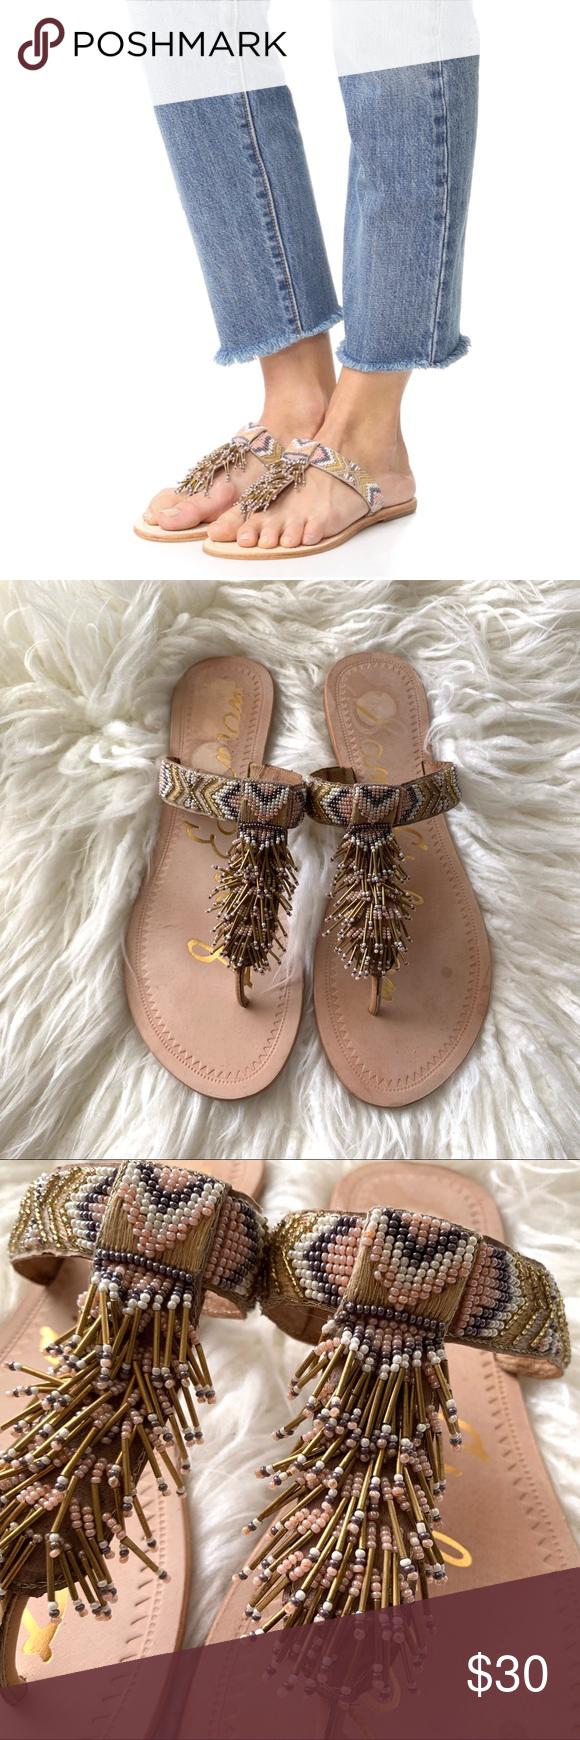 623b7770c812 Sam Edelman Anella Leather Beaded Flat Sandal Sam Edelman Anella Leather  Beaded Flat Sandal  Thong